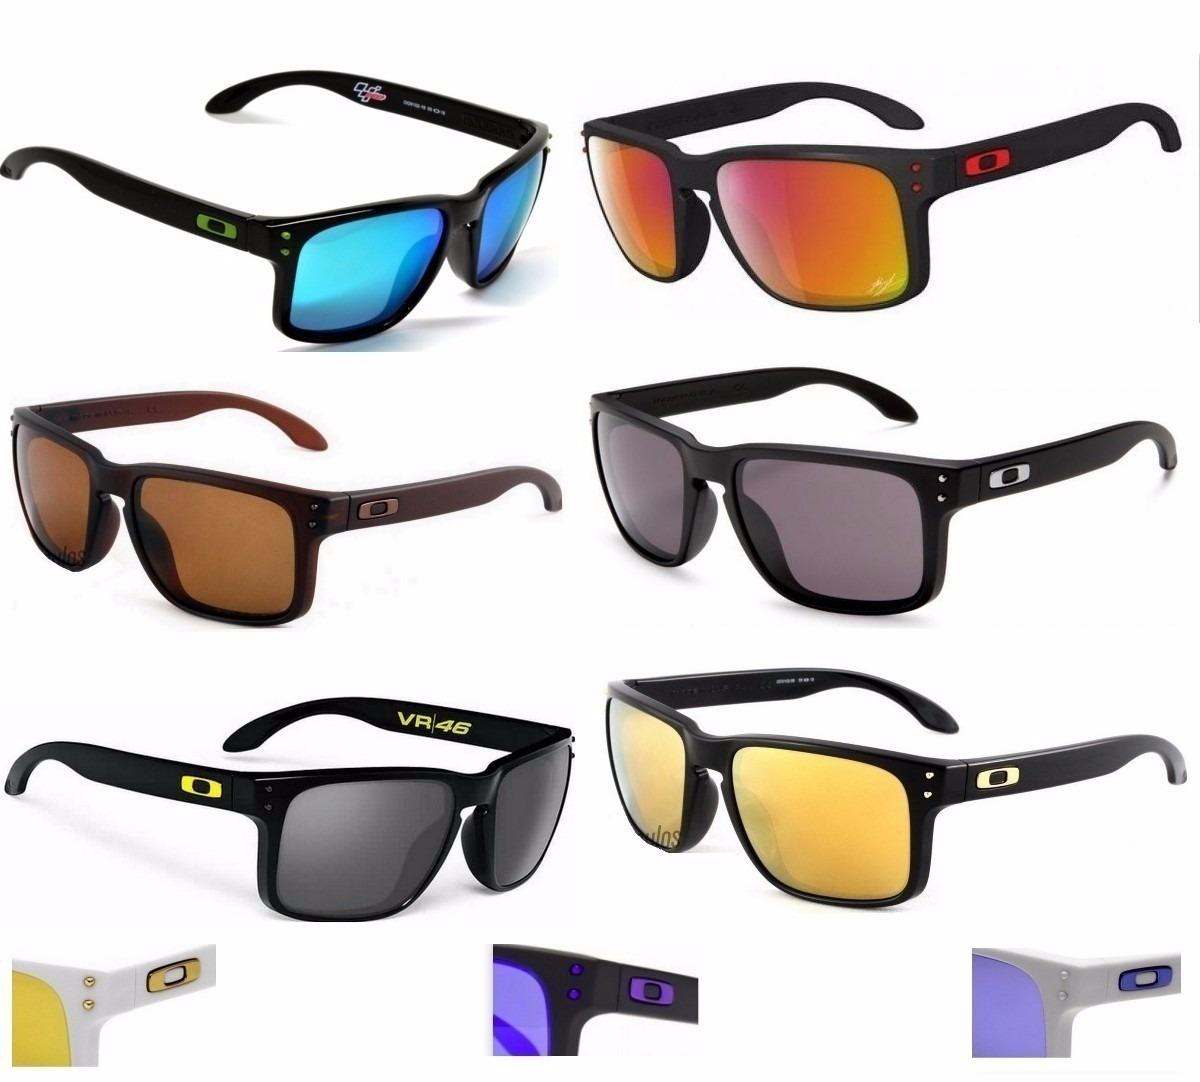 ba037aafbac10 óculos Oakley Holbrook Original. Oculos Da Oakley Holbrook Feminino    Louisiana Bucket Brigade Óculos De Sol Oakley Holbrook OO9102 26 Tam. 55Oakley ...